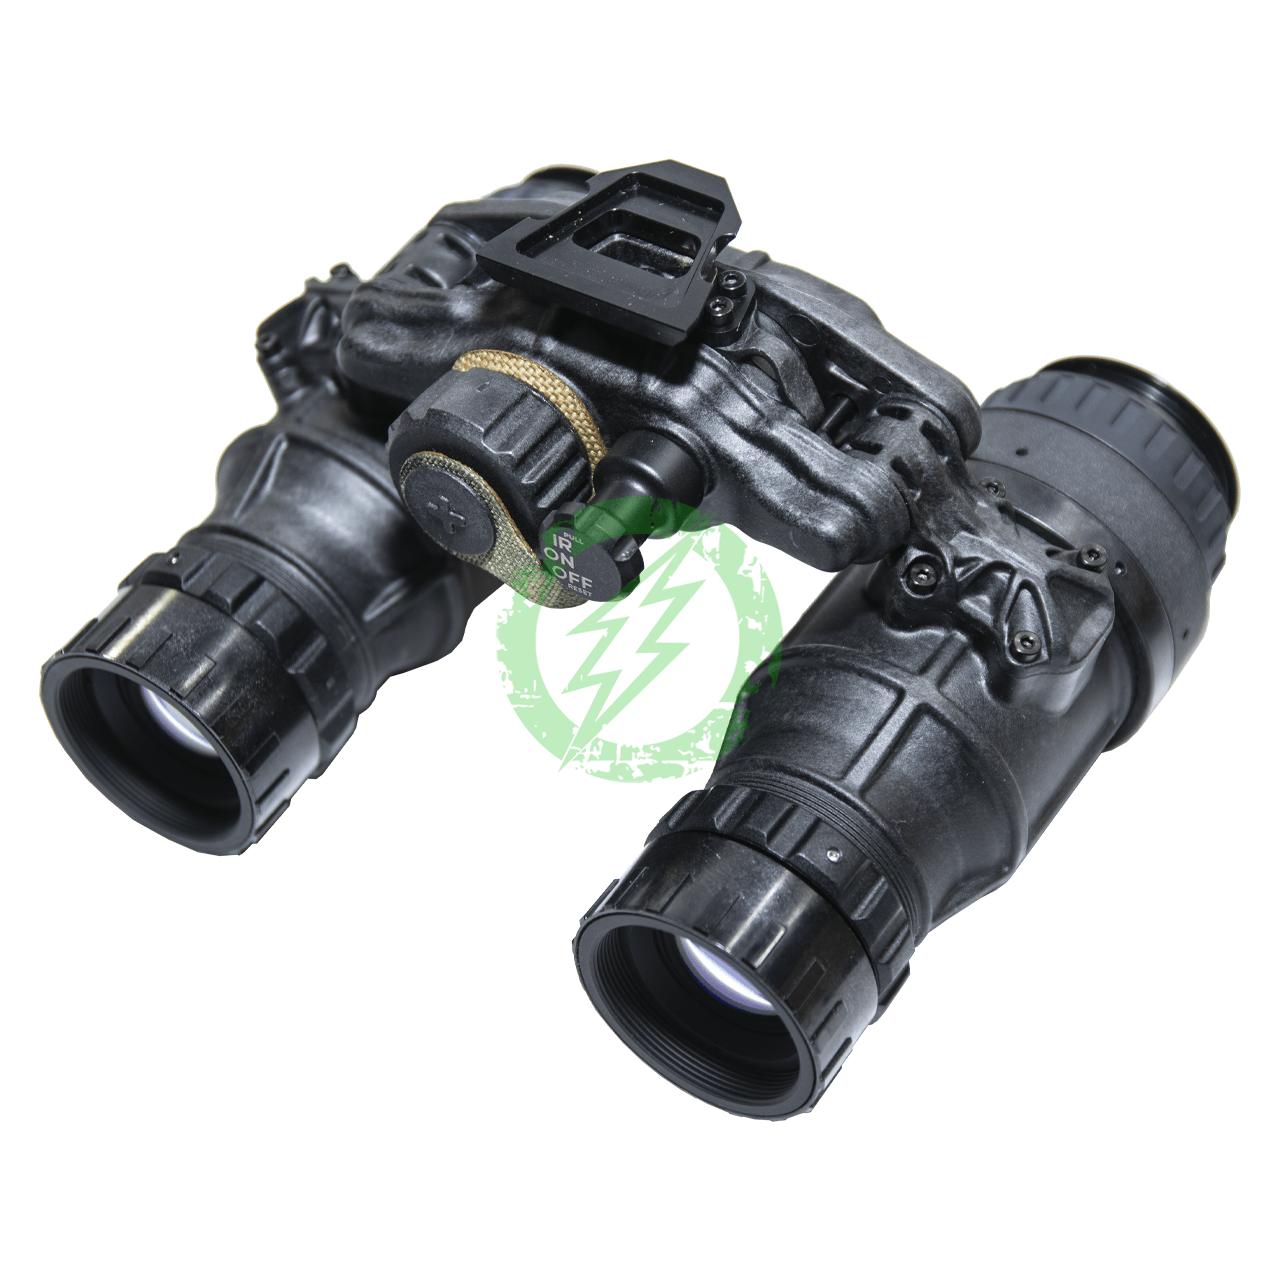 4G ECHO White Phosphor ACT DTNVS-14 Binocular Night Vision Device